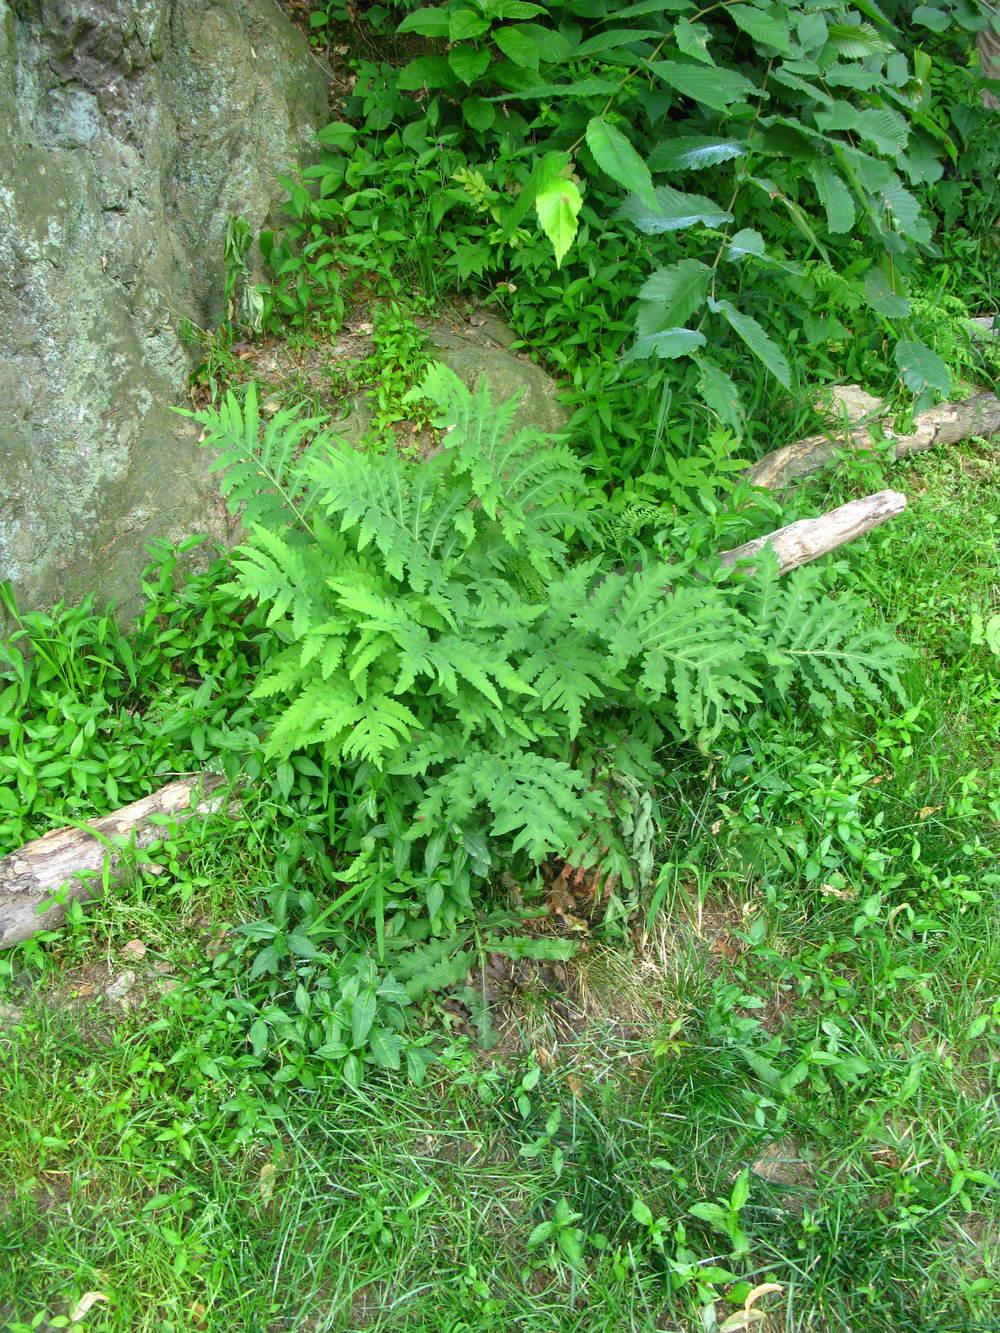 Onoclea sensibilisOnocleaceae